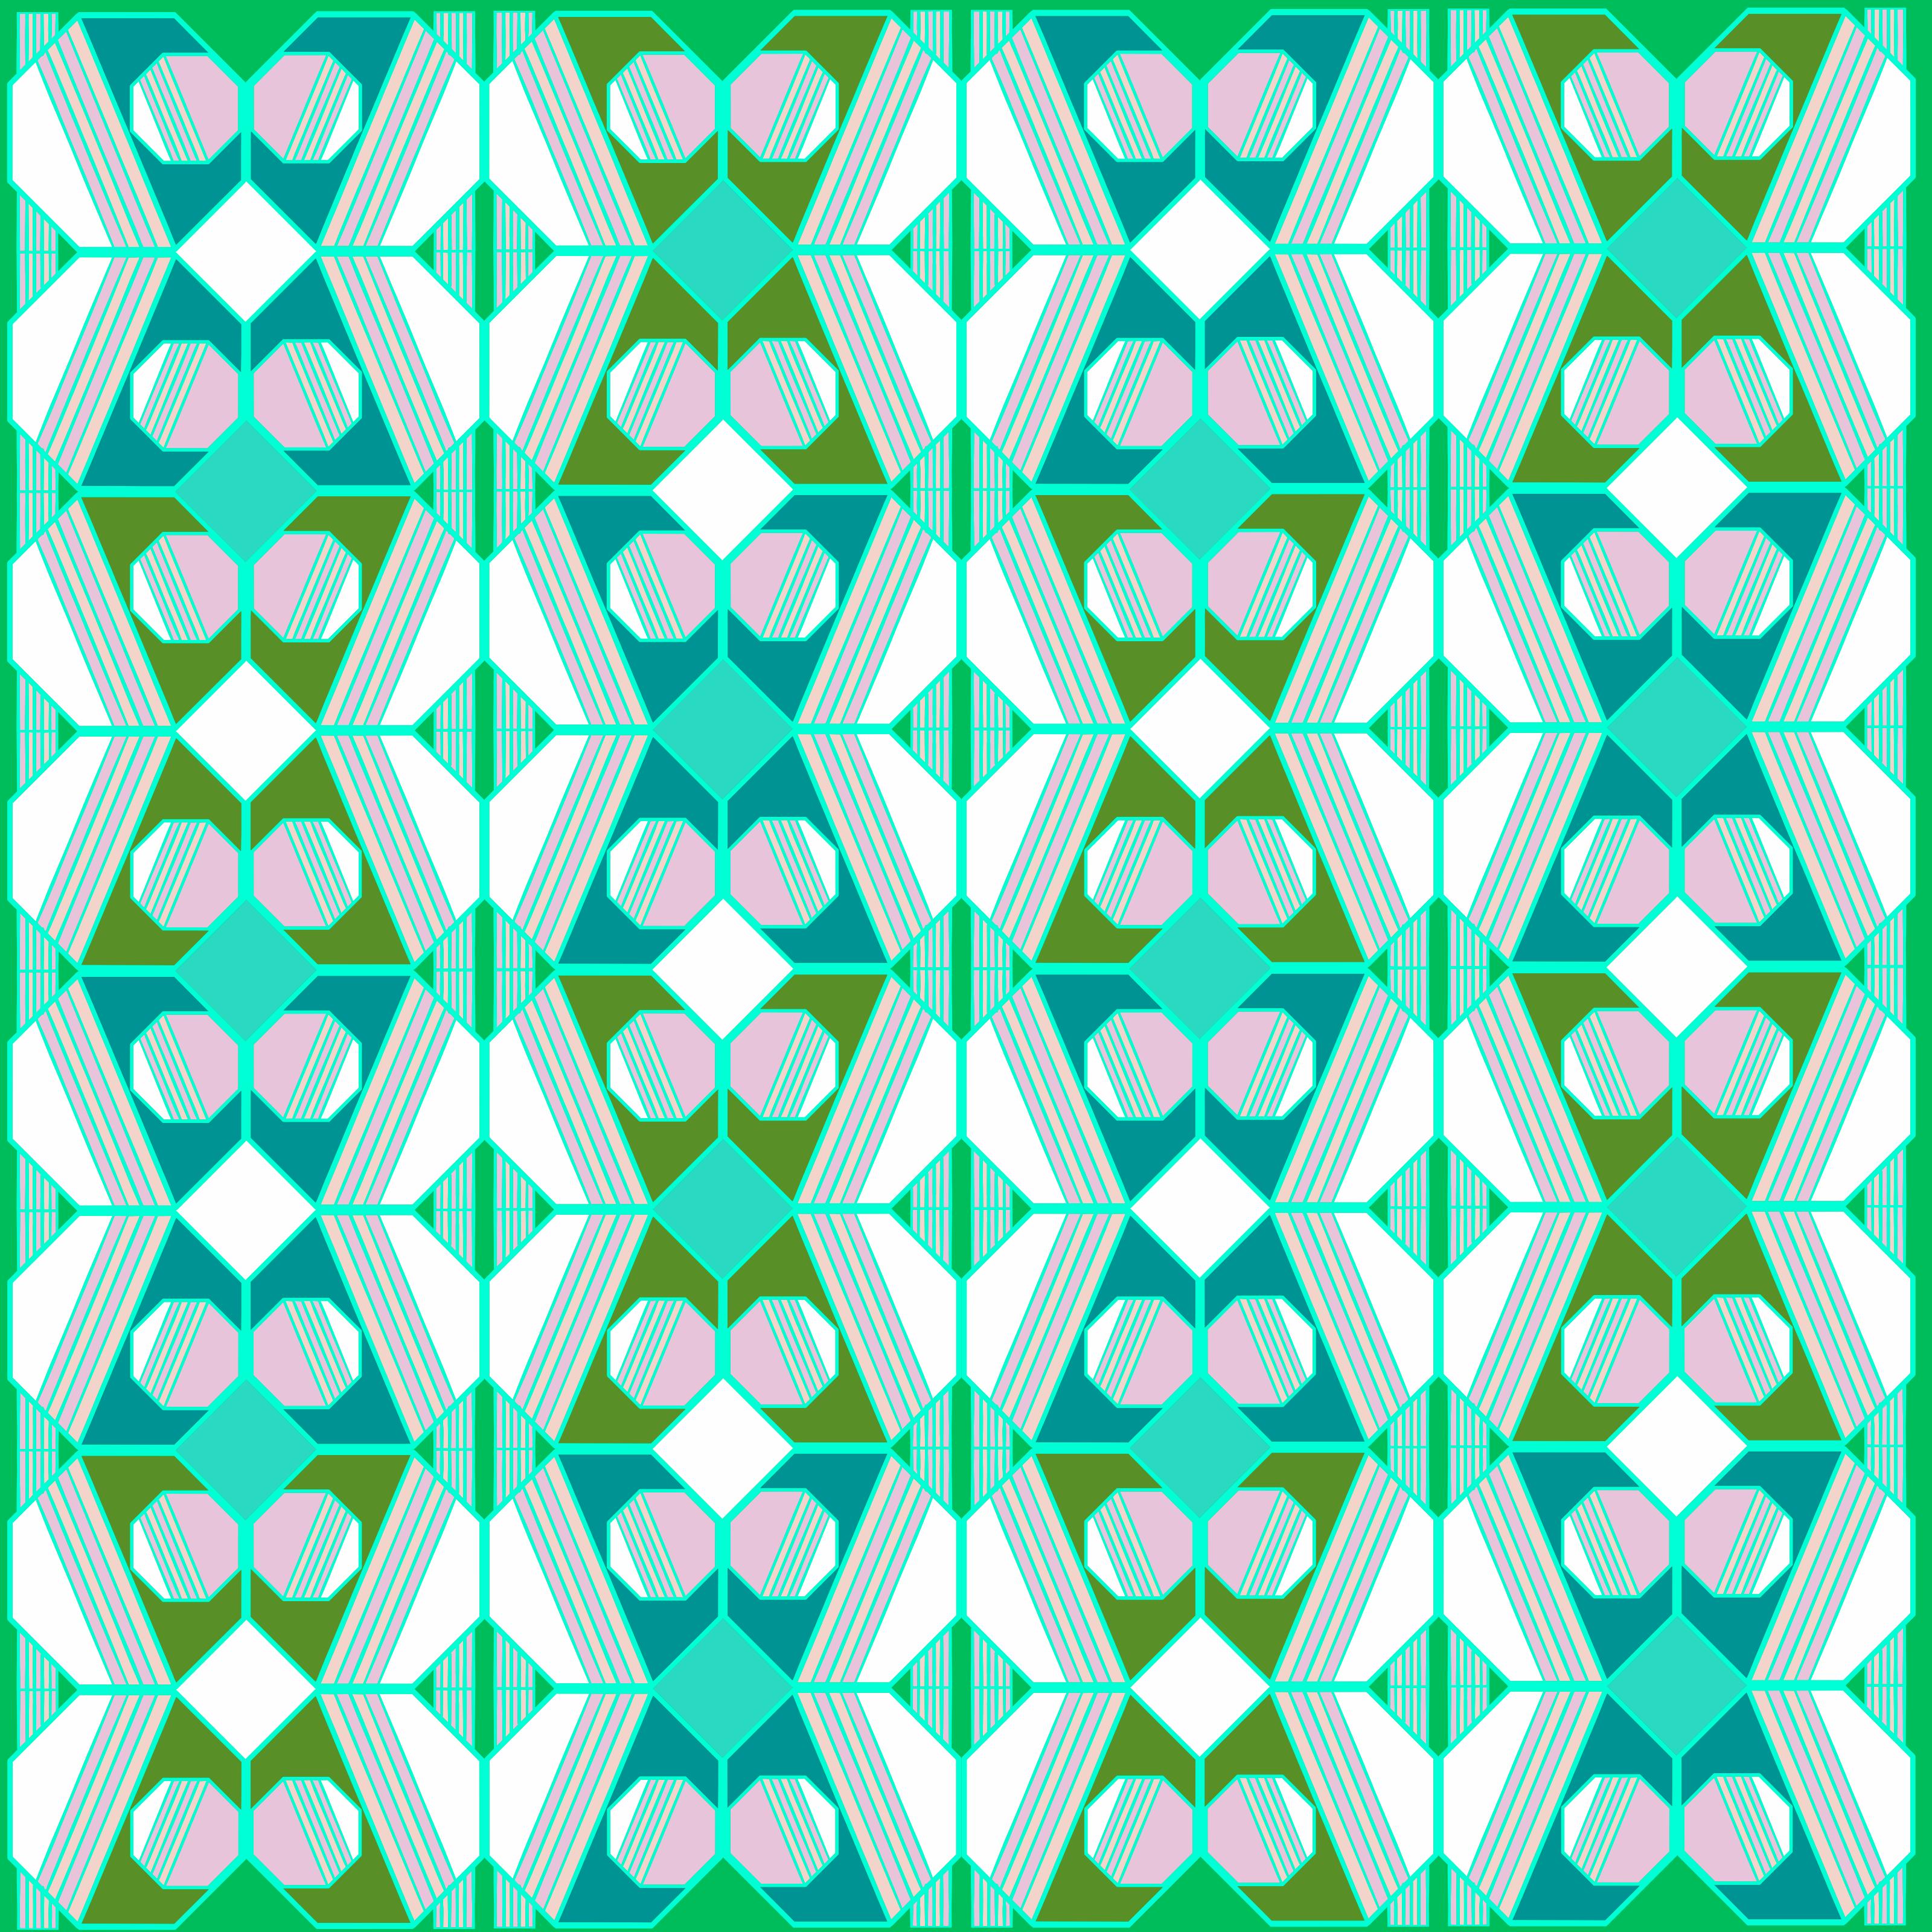 Mint Choc Chip Fabric